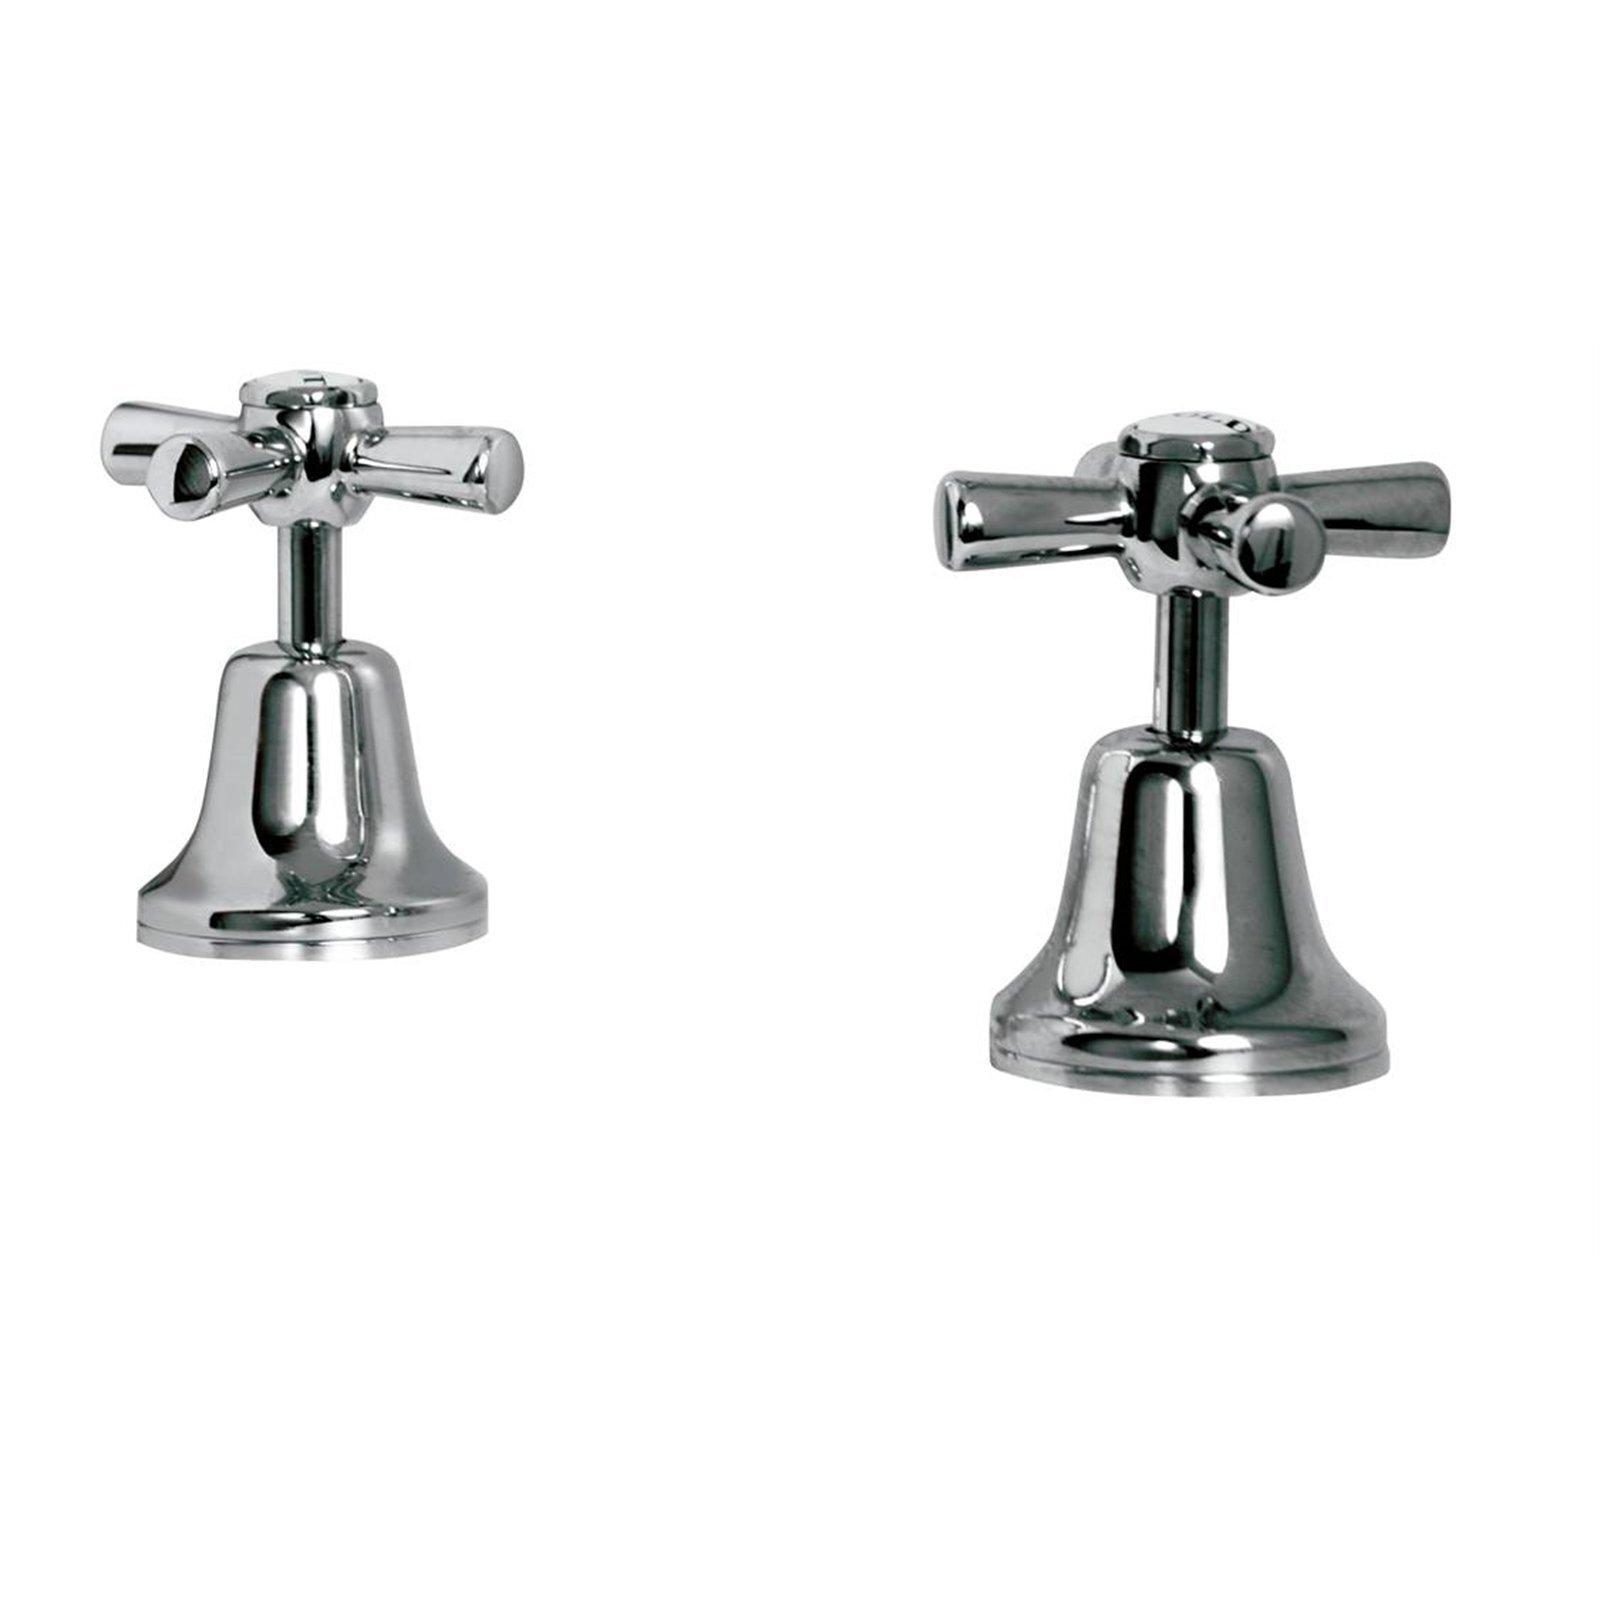 Basin/sink Set Ezyfix Chrome 2815-02